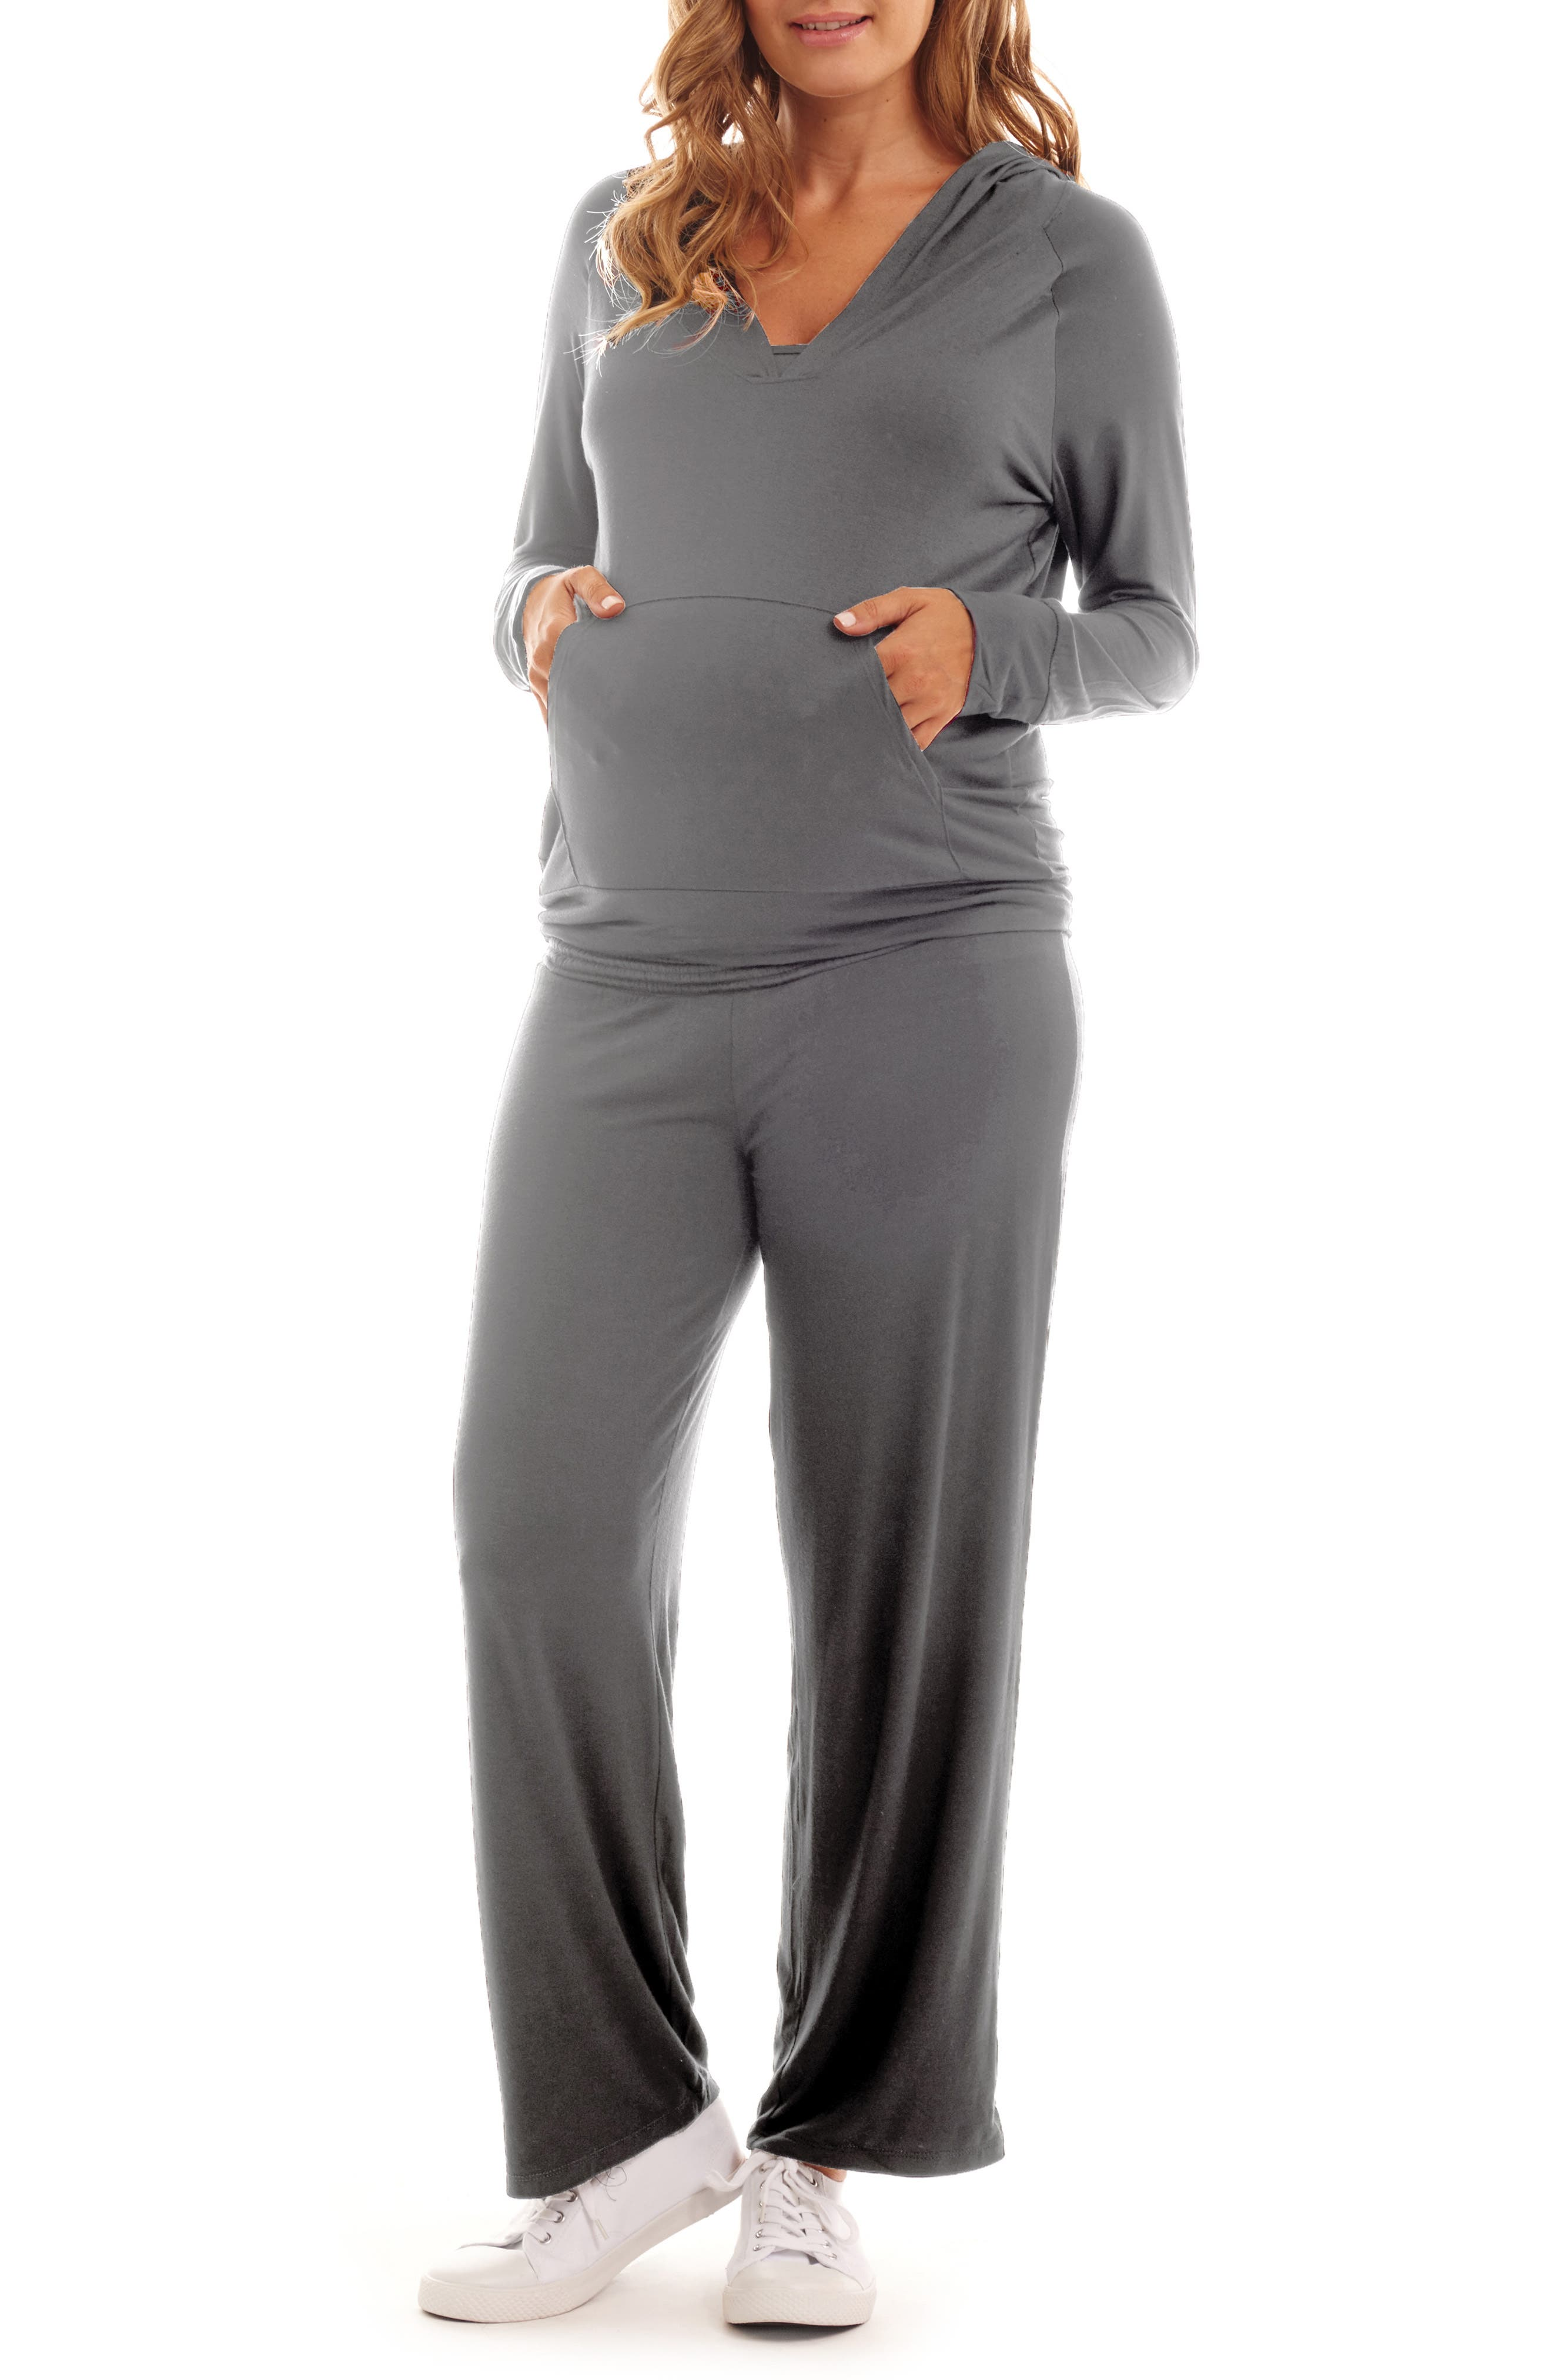 EVERLY GREY Irene Maternity/Nursing Hoodie & Pants Set, Main, color, CHARCOAL